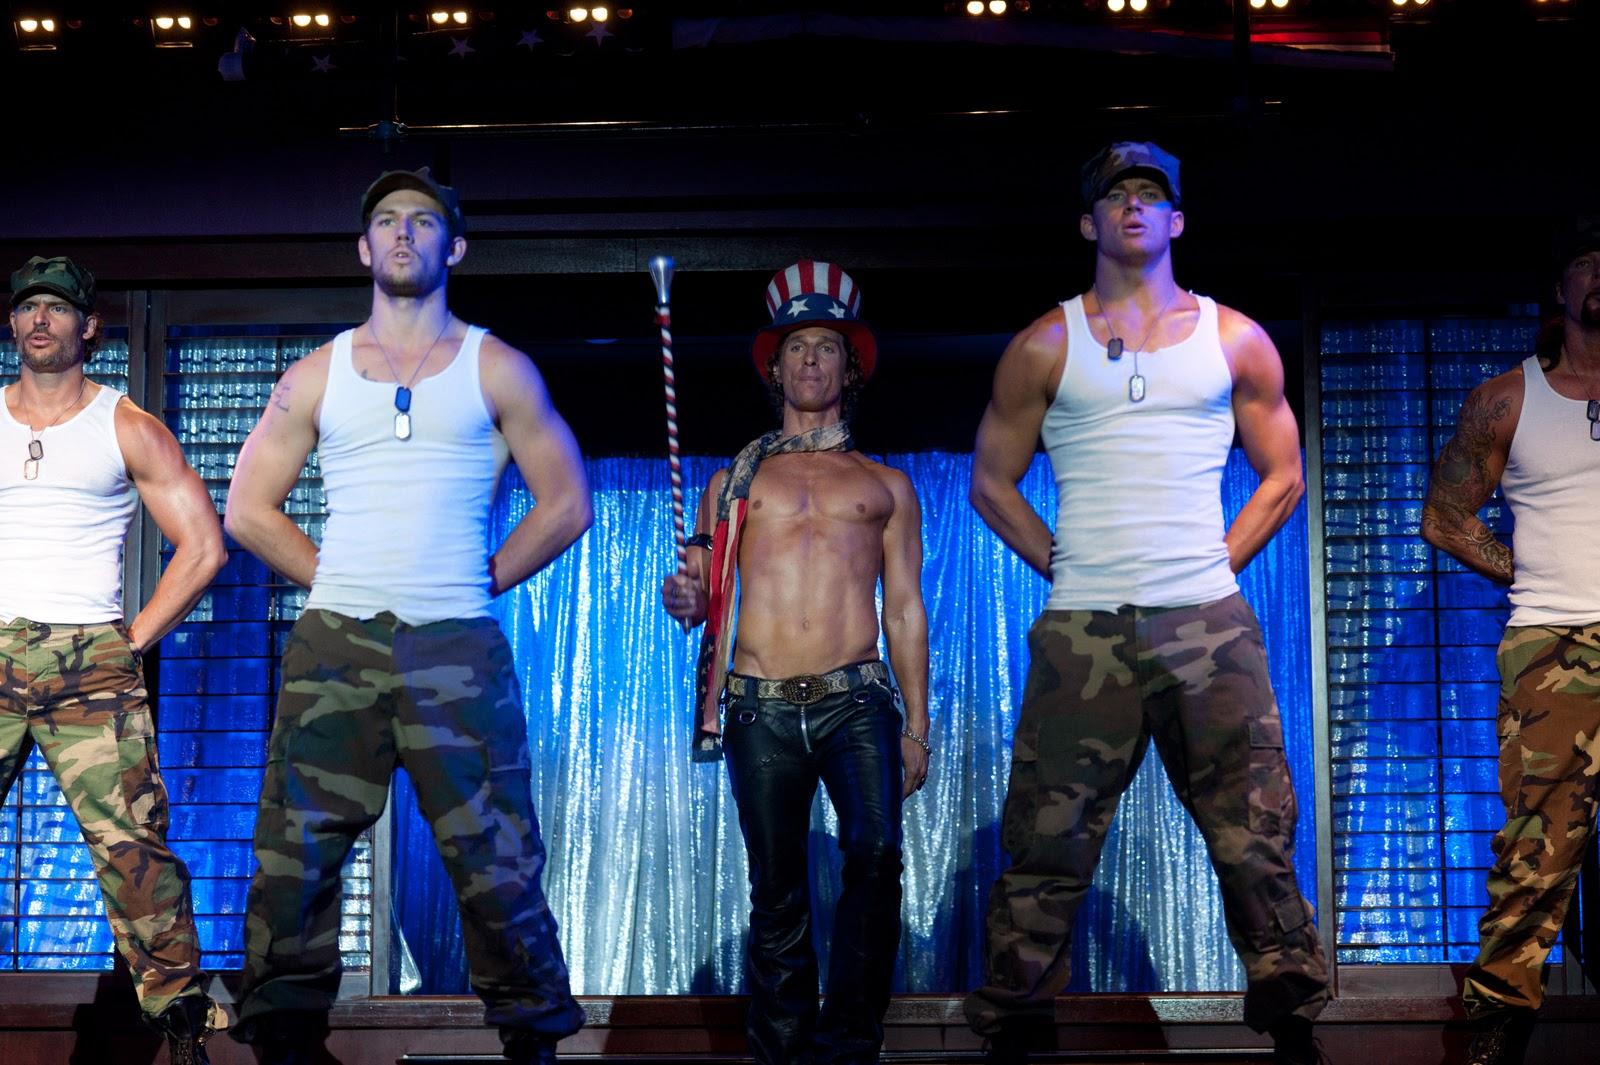 http://3.bp.blogspot.com/-J_0Y3gP8epI/TxCGj3phU4I/AAAAAAAAFek/LjrGNvPMzGs/s1600/Magic-Mike-image-Matthew-McConaughey-Channing-Tatum-Joe-Mangianello.jpg